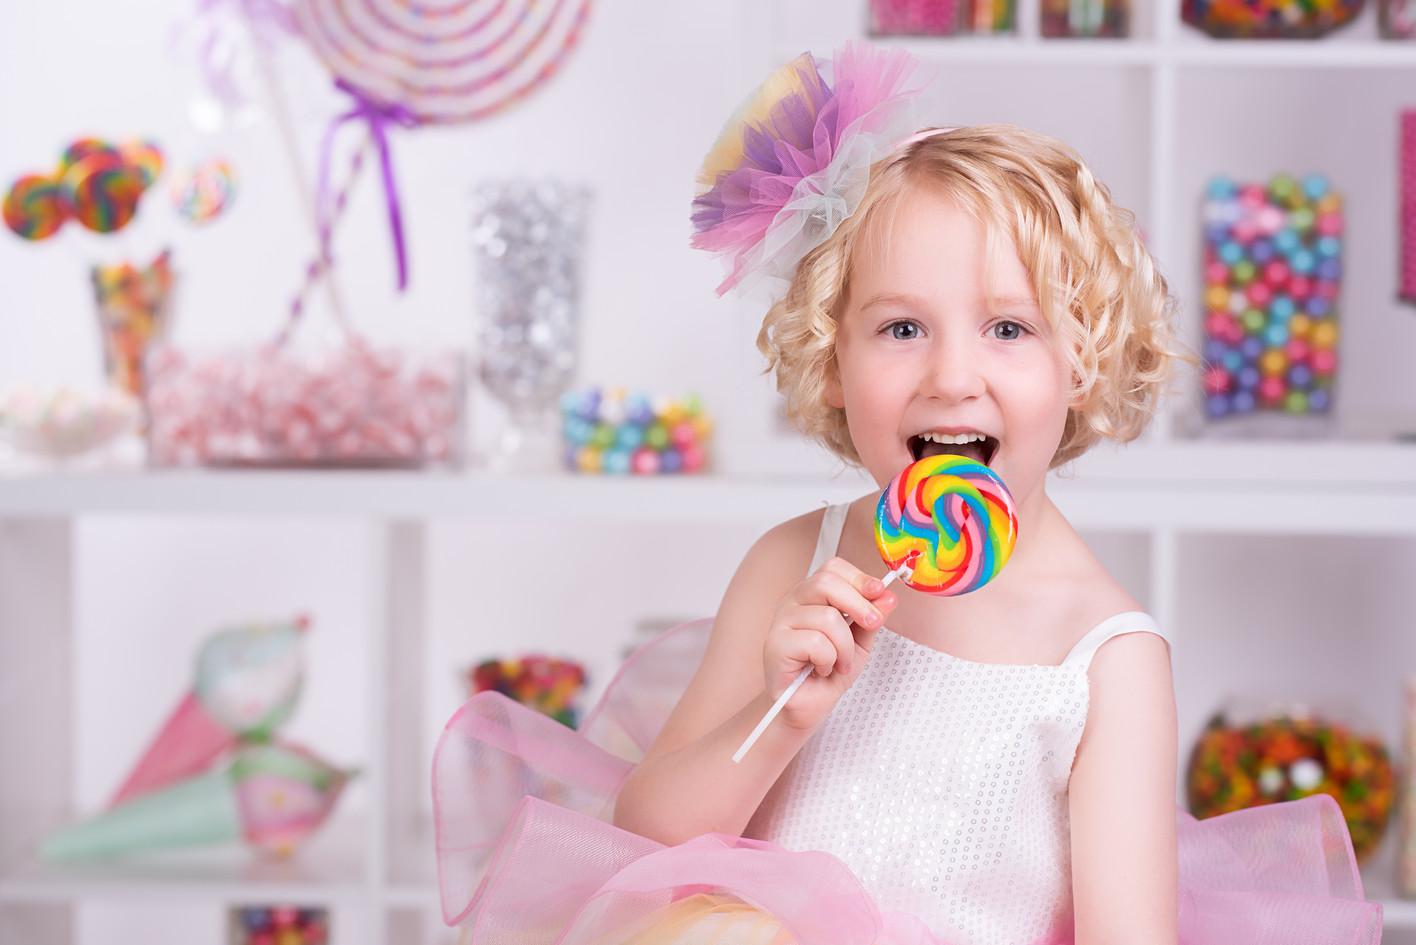 Rainbow lollipop in a candy land